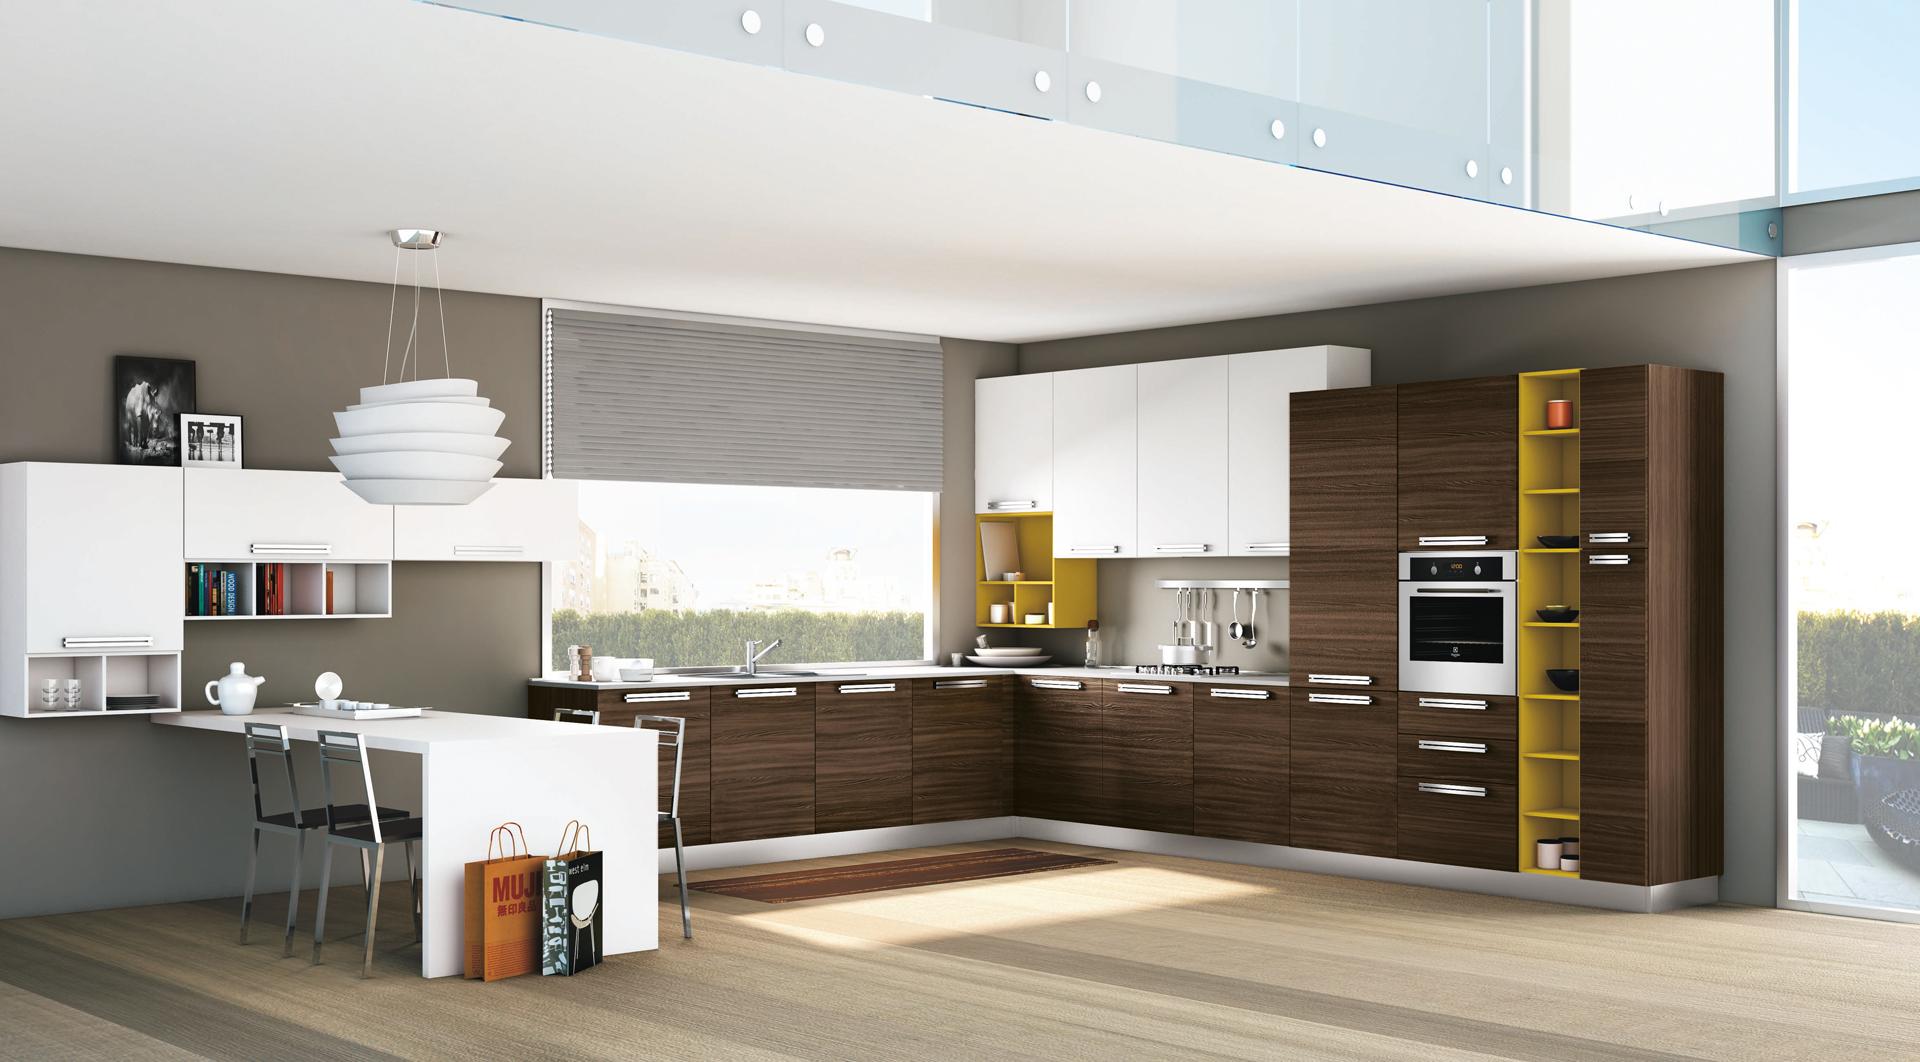 Cucina moderna lube inka creo kitchens for Cucine moderne scure